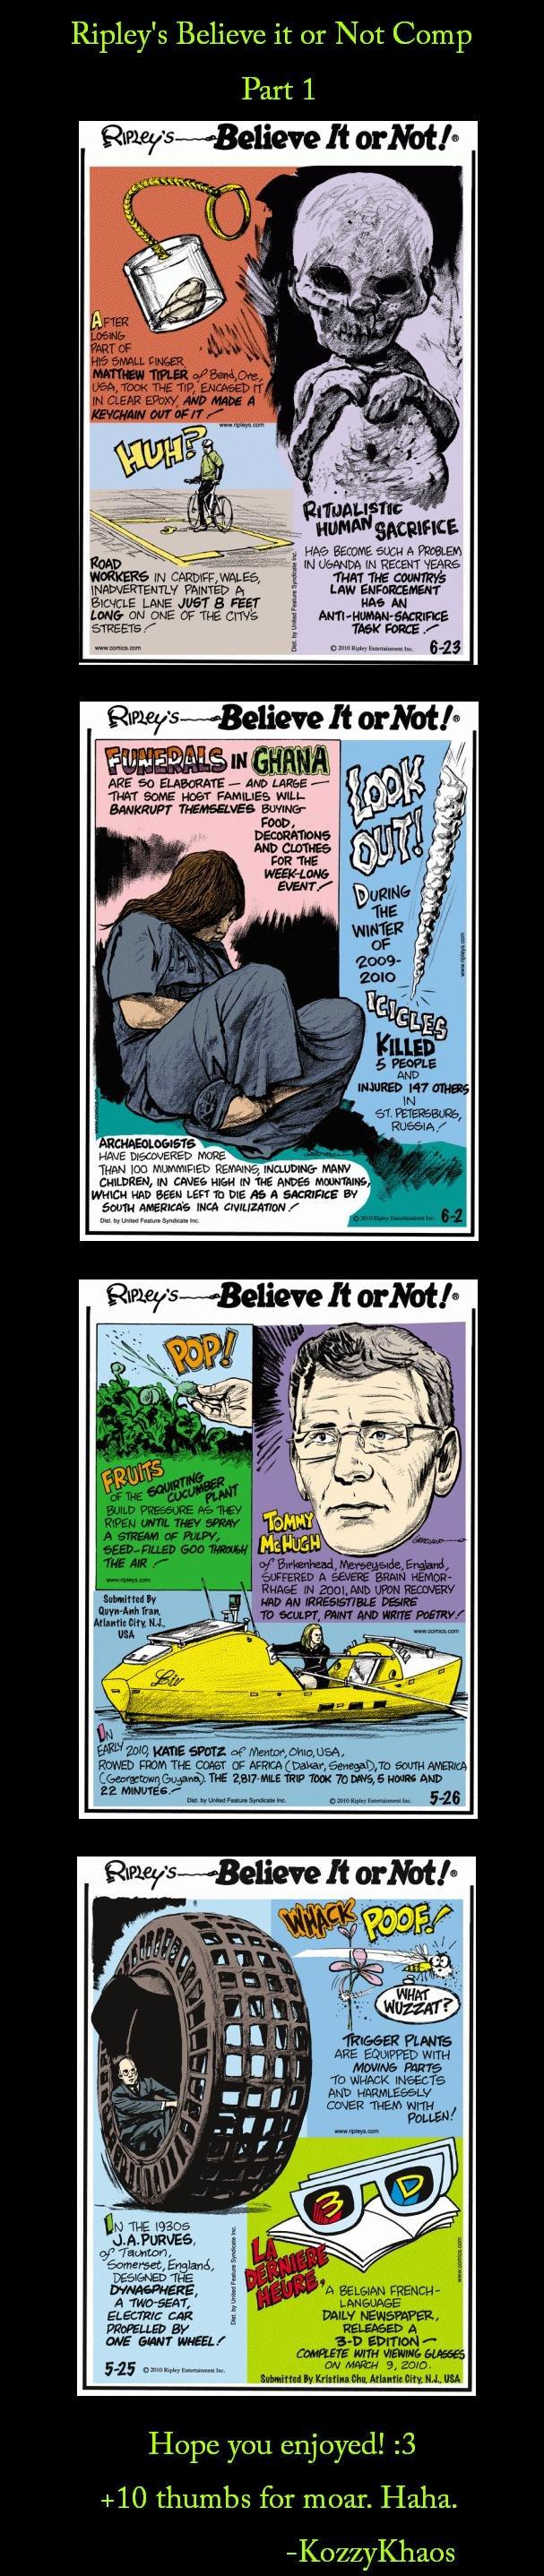 Ripley's Believe it or Not Comp 1. <3 :] I've always loved Ripley's.<br /> /funny_pictures/1053259/Ripley+s+Beli.... Ripley' s Believe it or Ne ripley believe it or Not yay